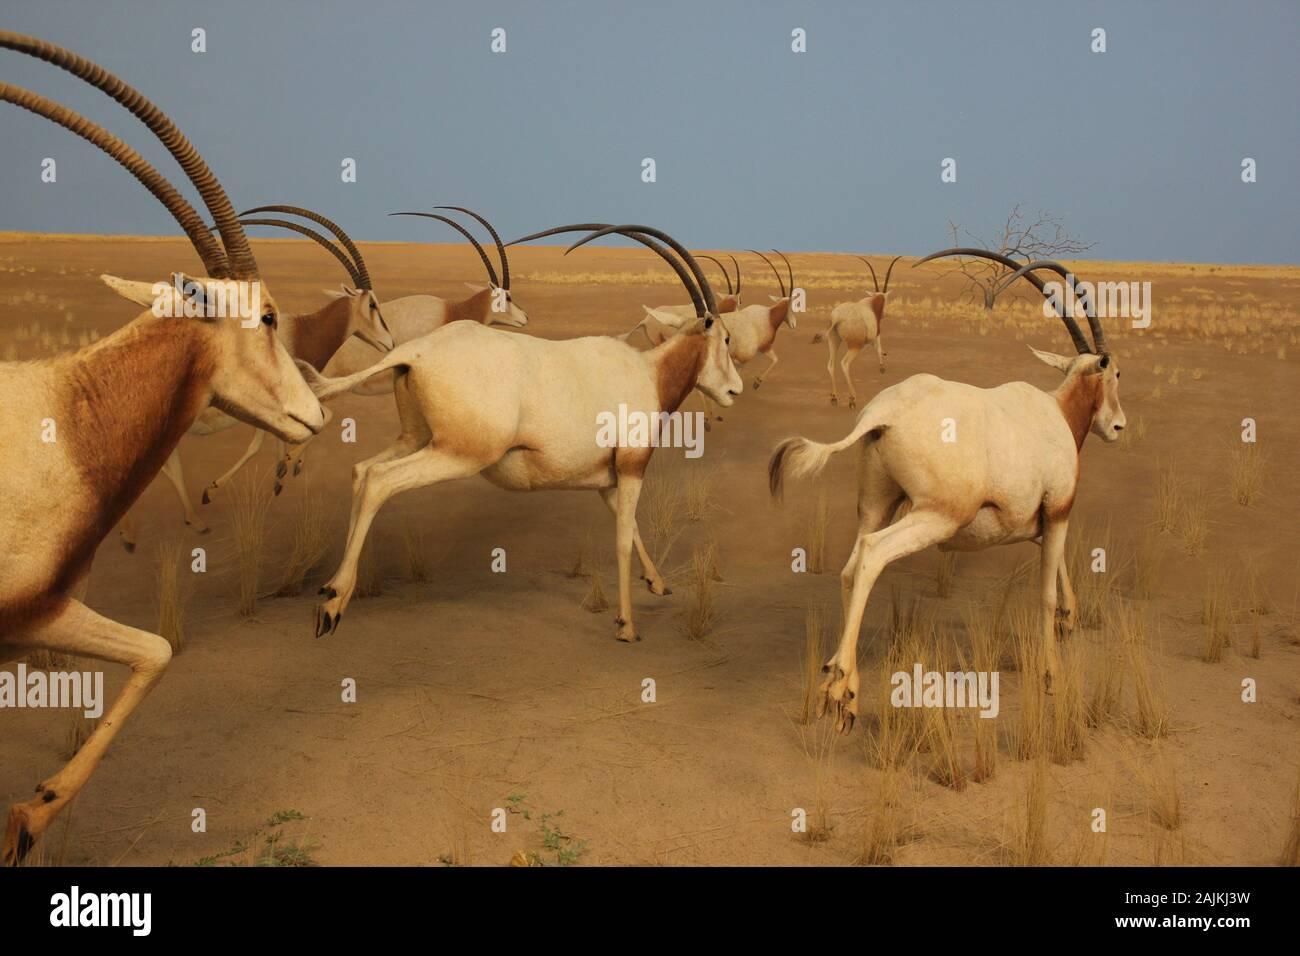 Scimitar oryx,  scimitar-horned oryx, oryx dammah, Sahara oryx the Museum Stock Photo